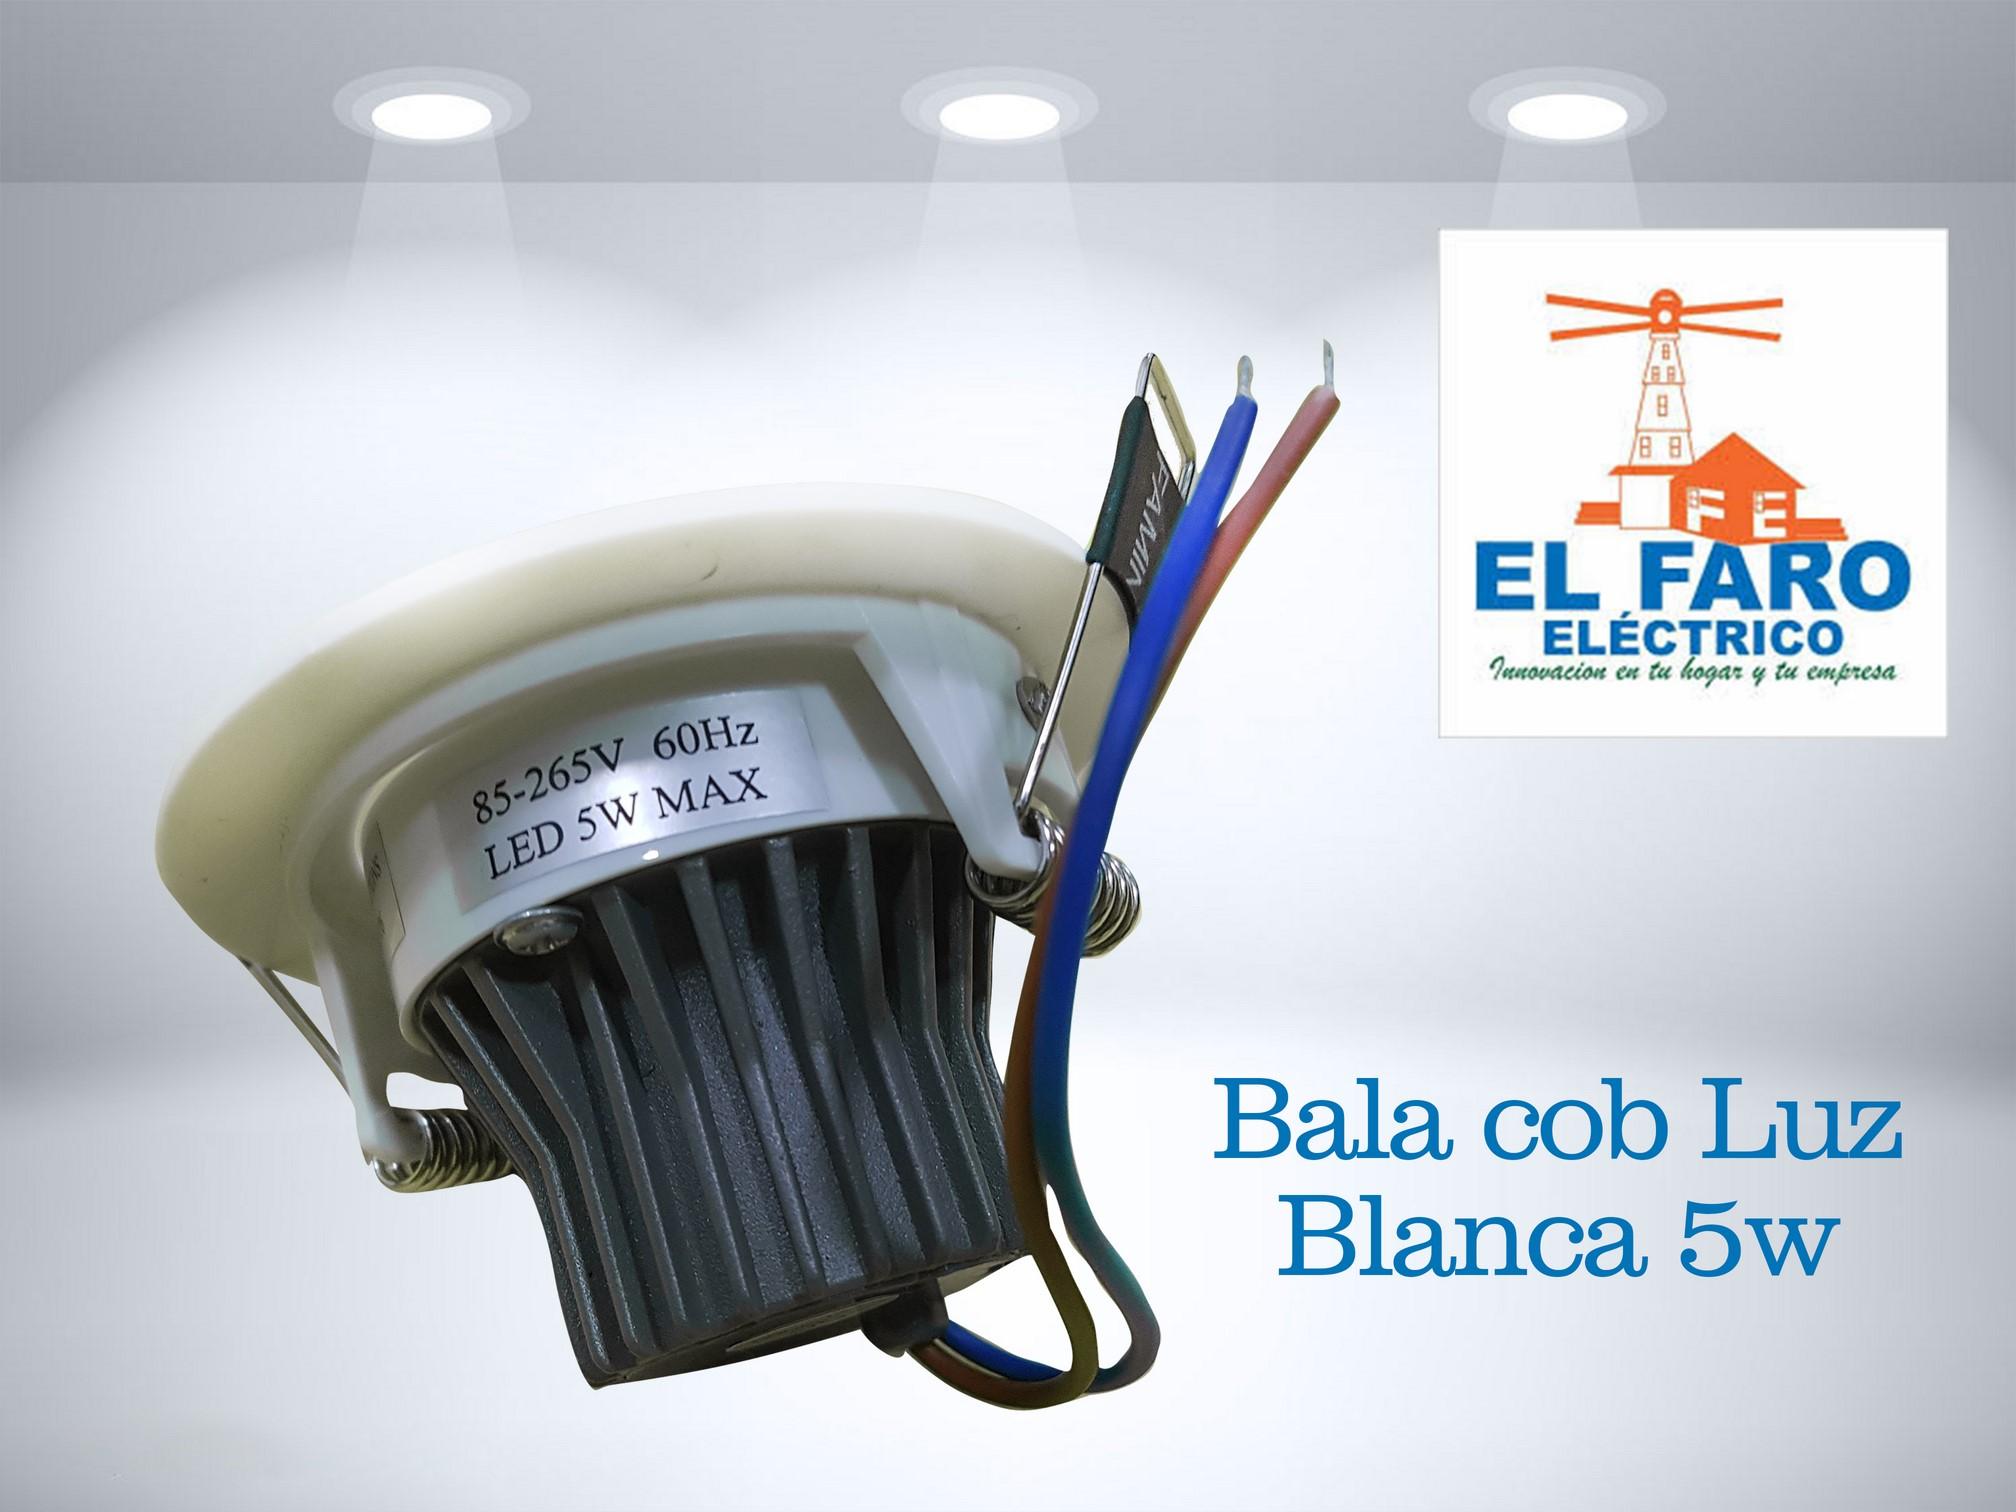 Bala cob Luz Blanca 5w